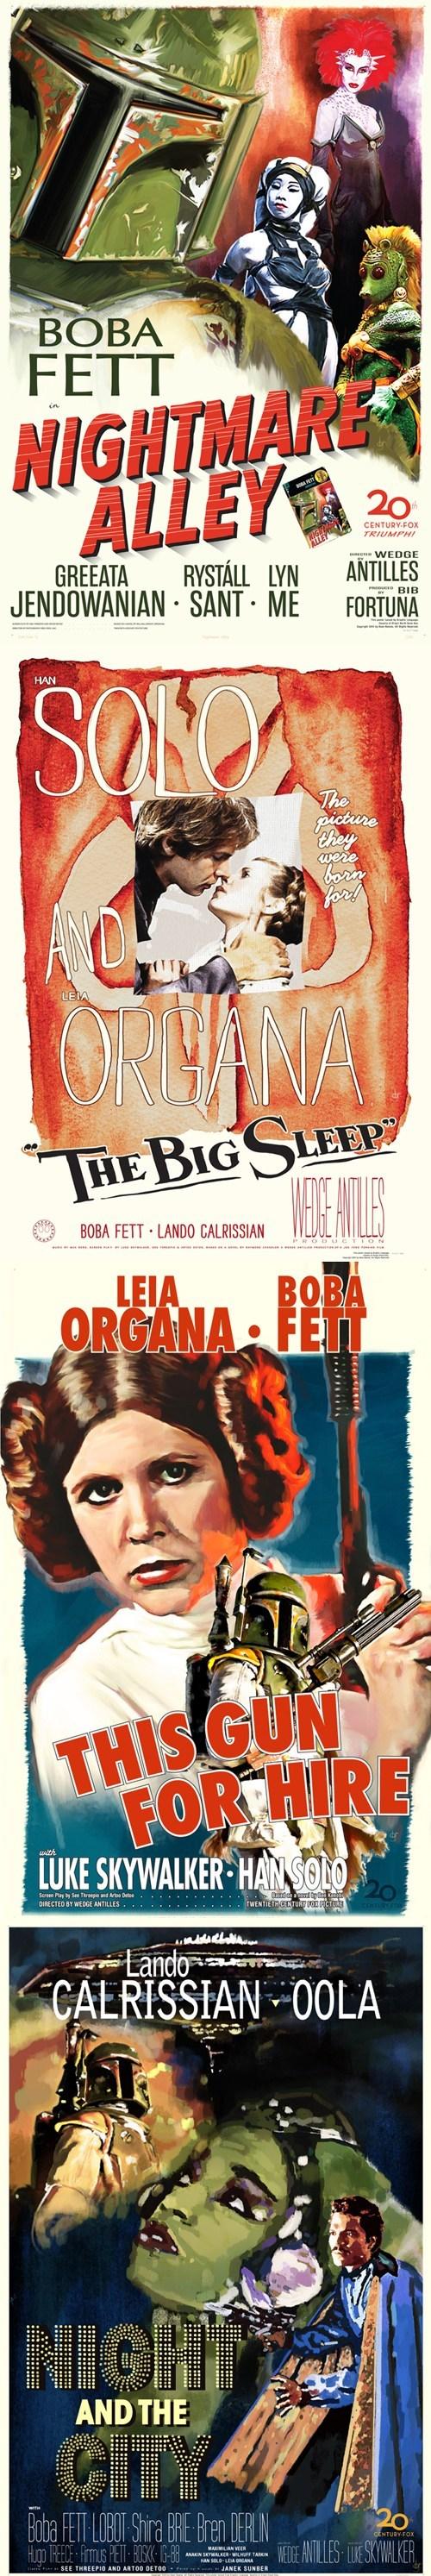 boba fett Han Solo movies posters Princess Leia scifi star wars - 6616498944